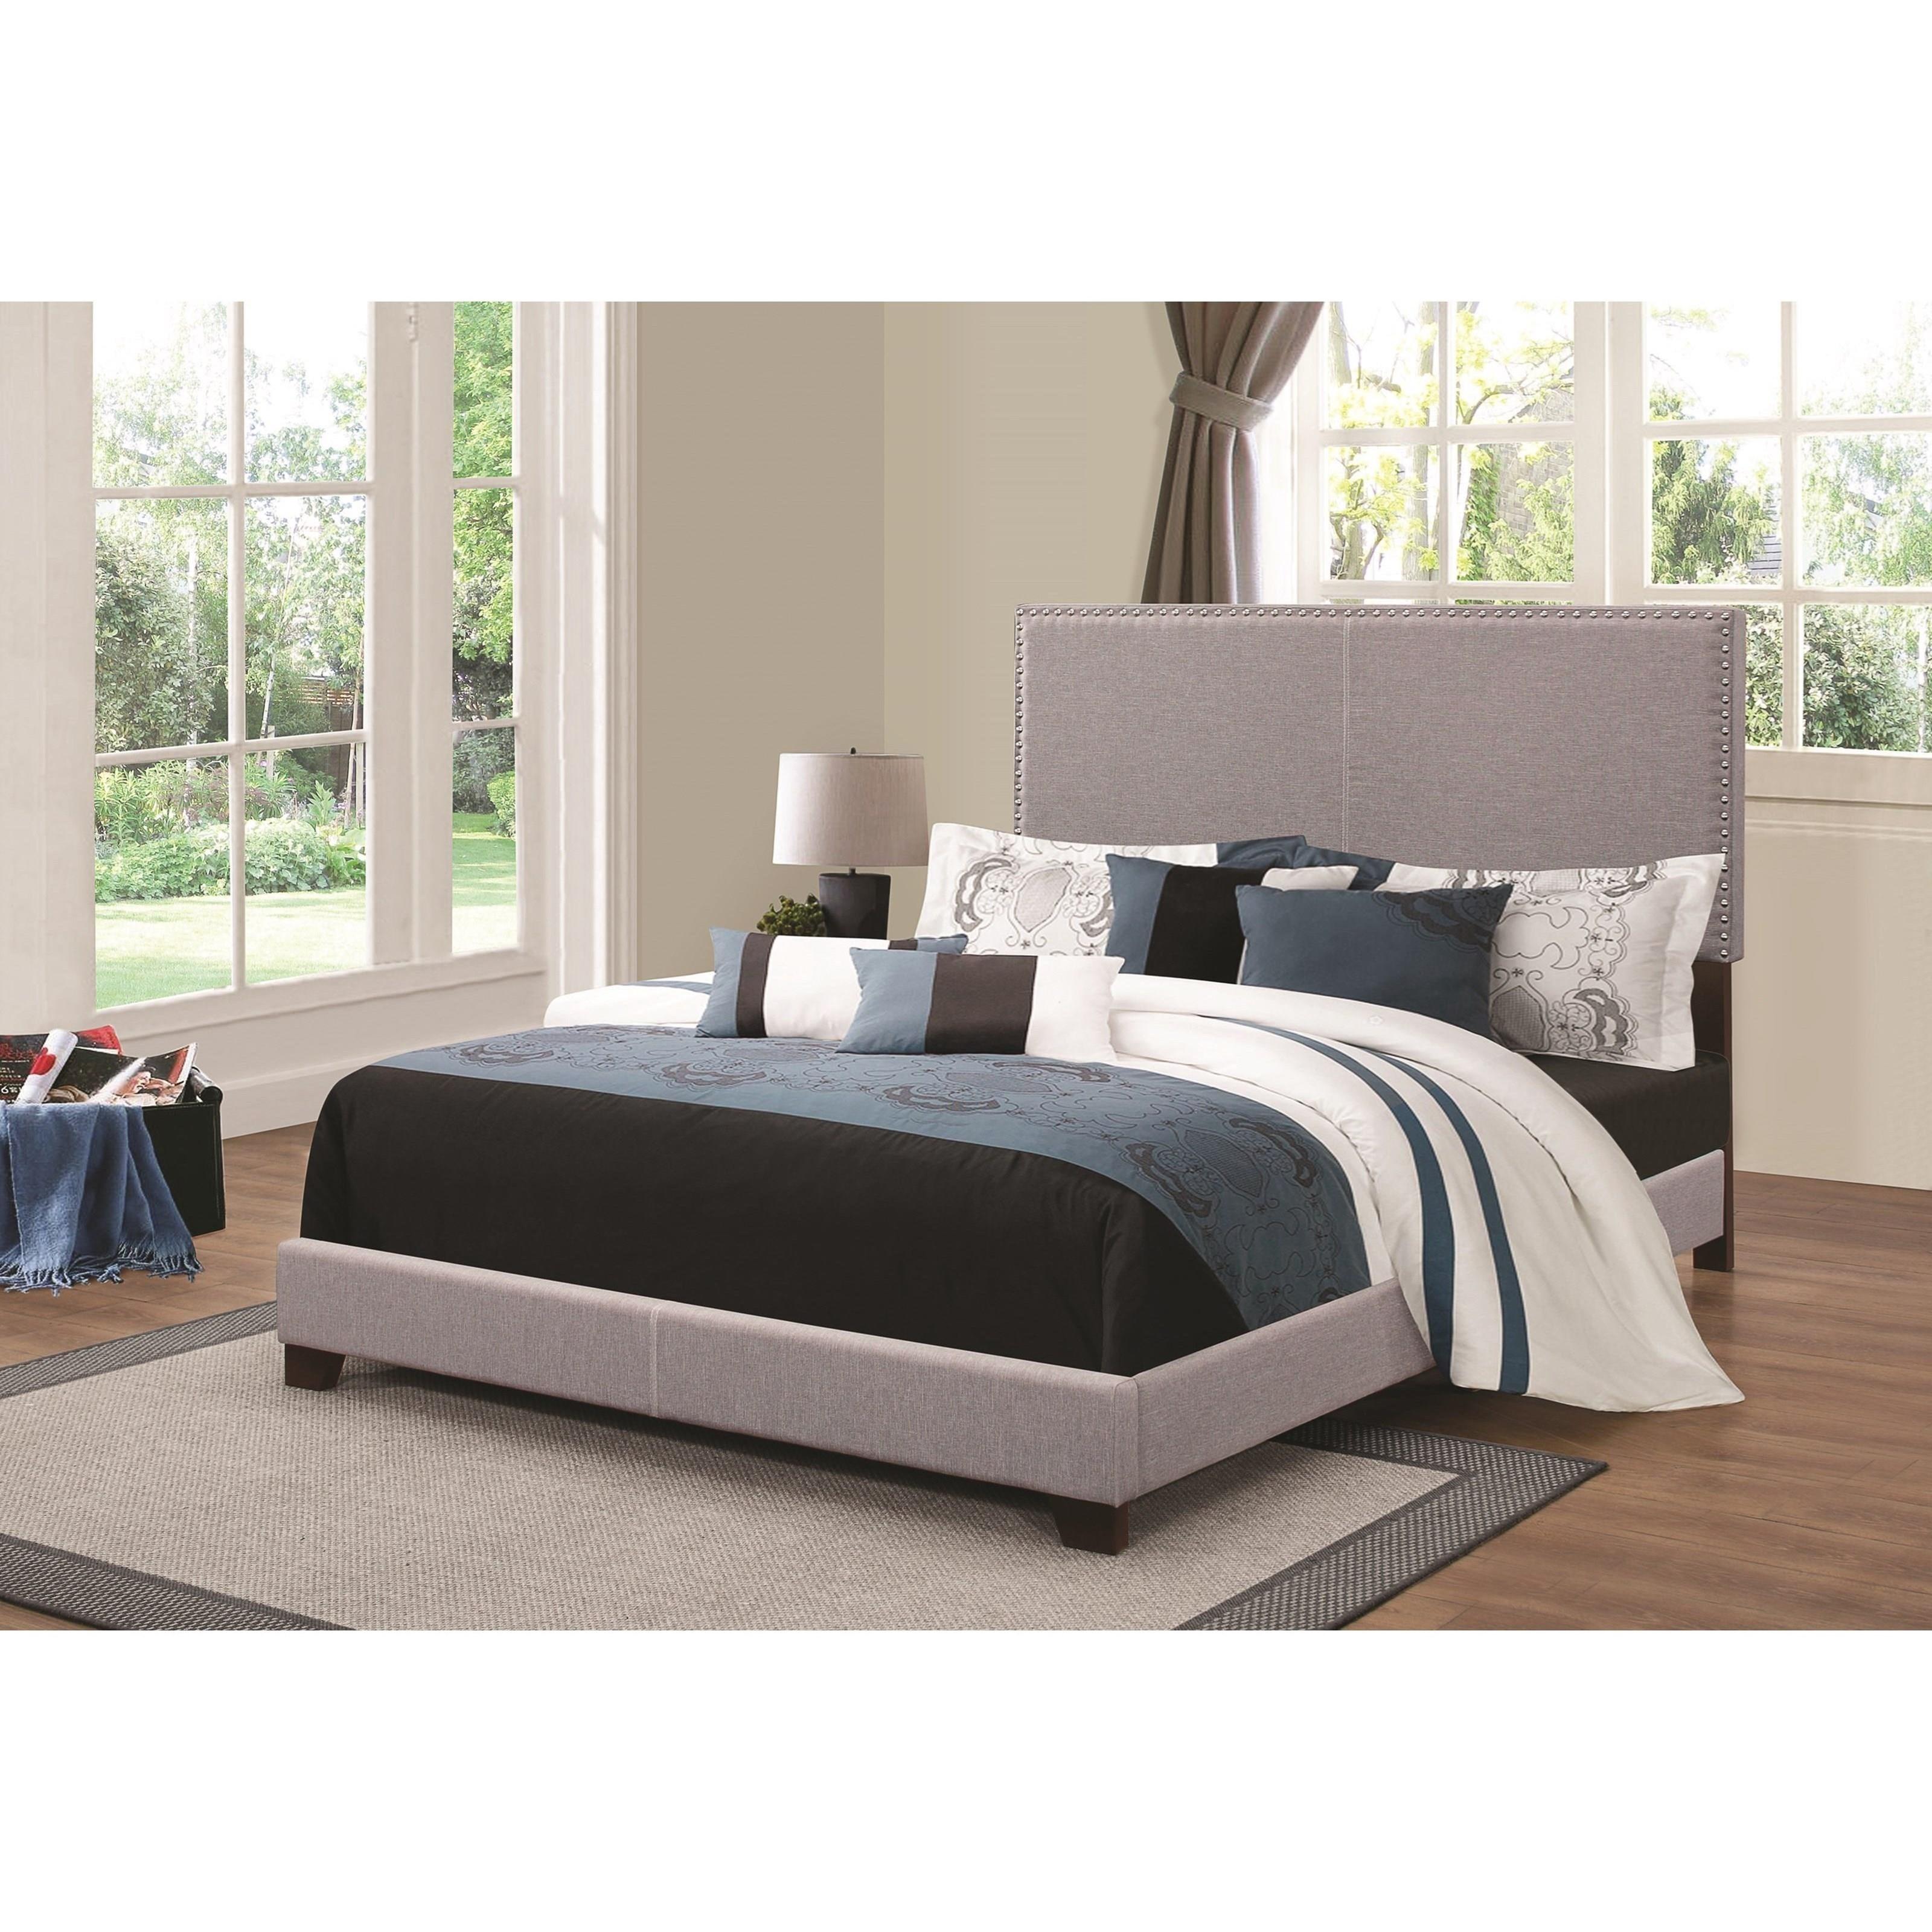 Coaster Upholstered Beds Cal King Bed - Item Number: 350071KW